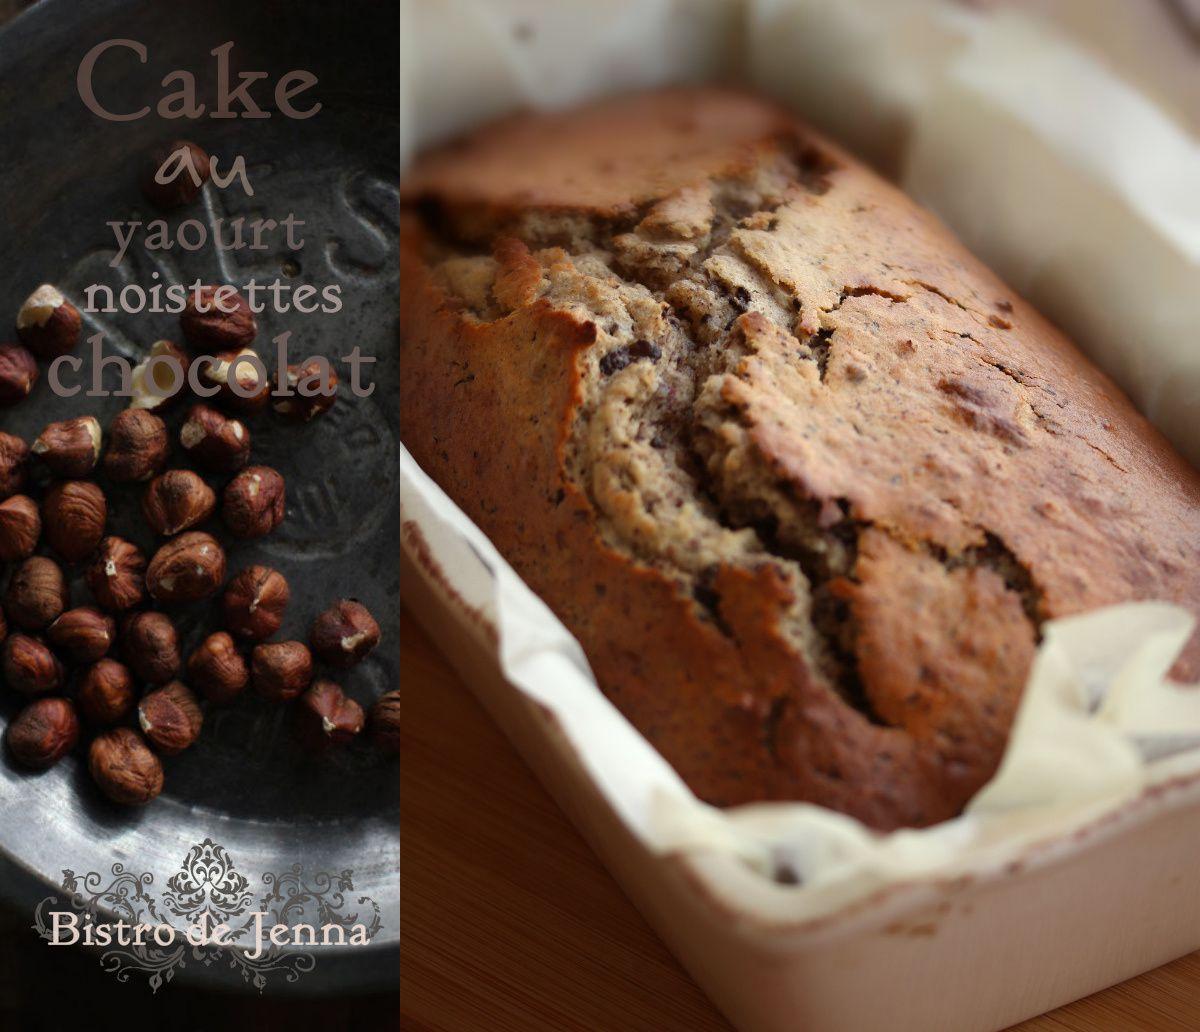 Cake Carottes Semoule